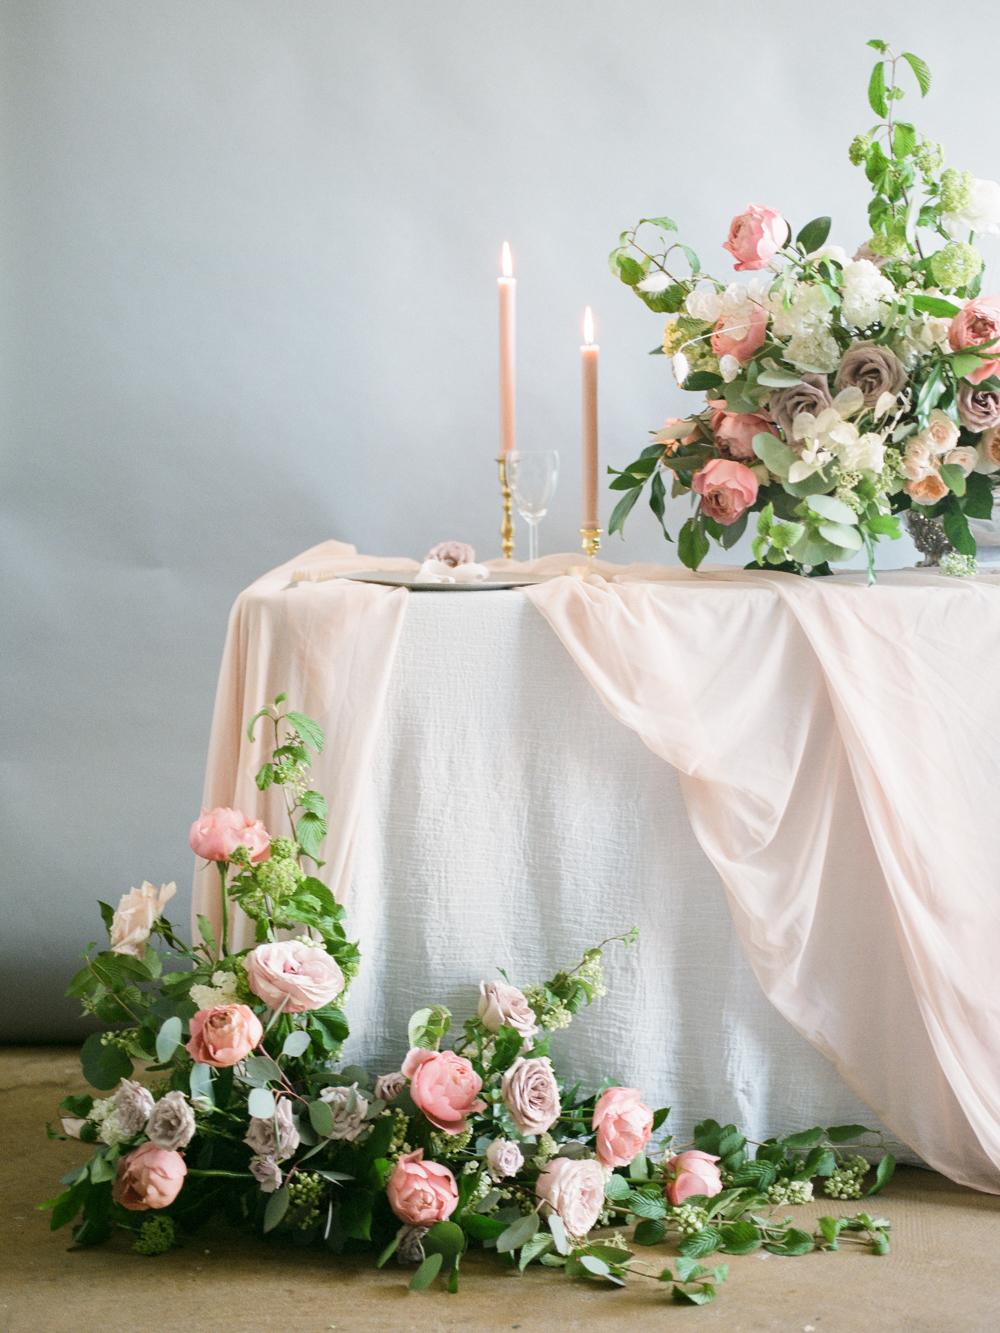 Christine Gosch - brand photographer - Maxit flower design - wedding florist-22.jpg